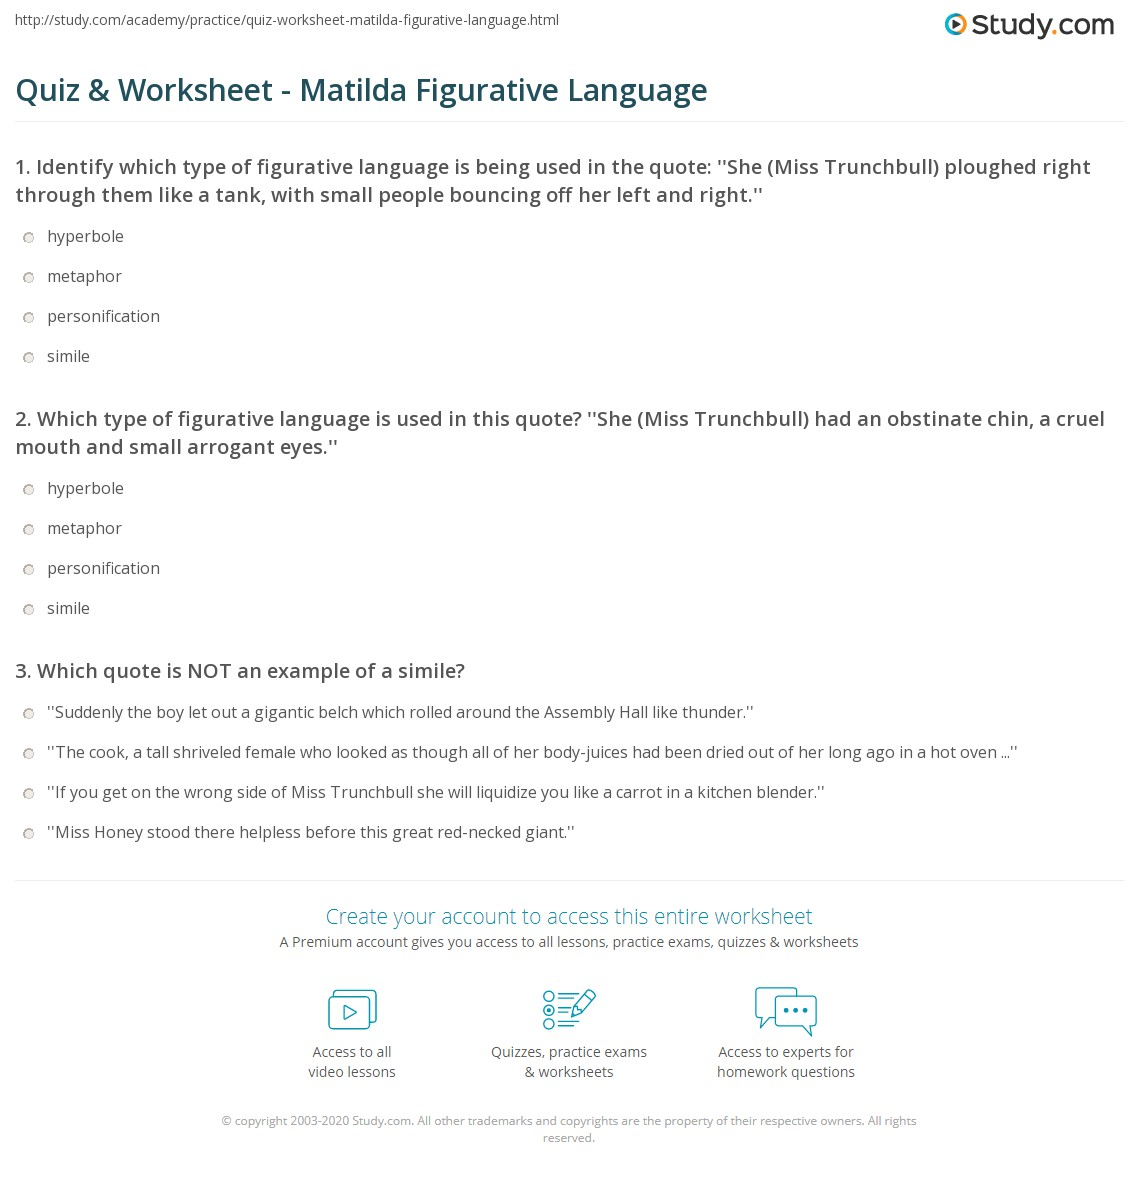 Quiz & Worksheet - Matilda Figurative Language | Study com